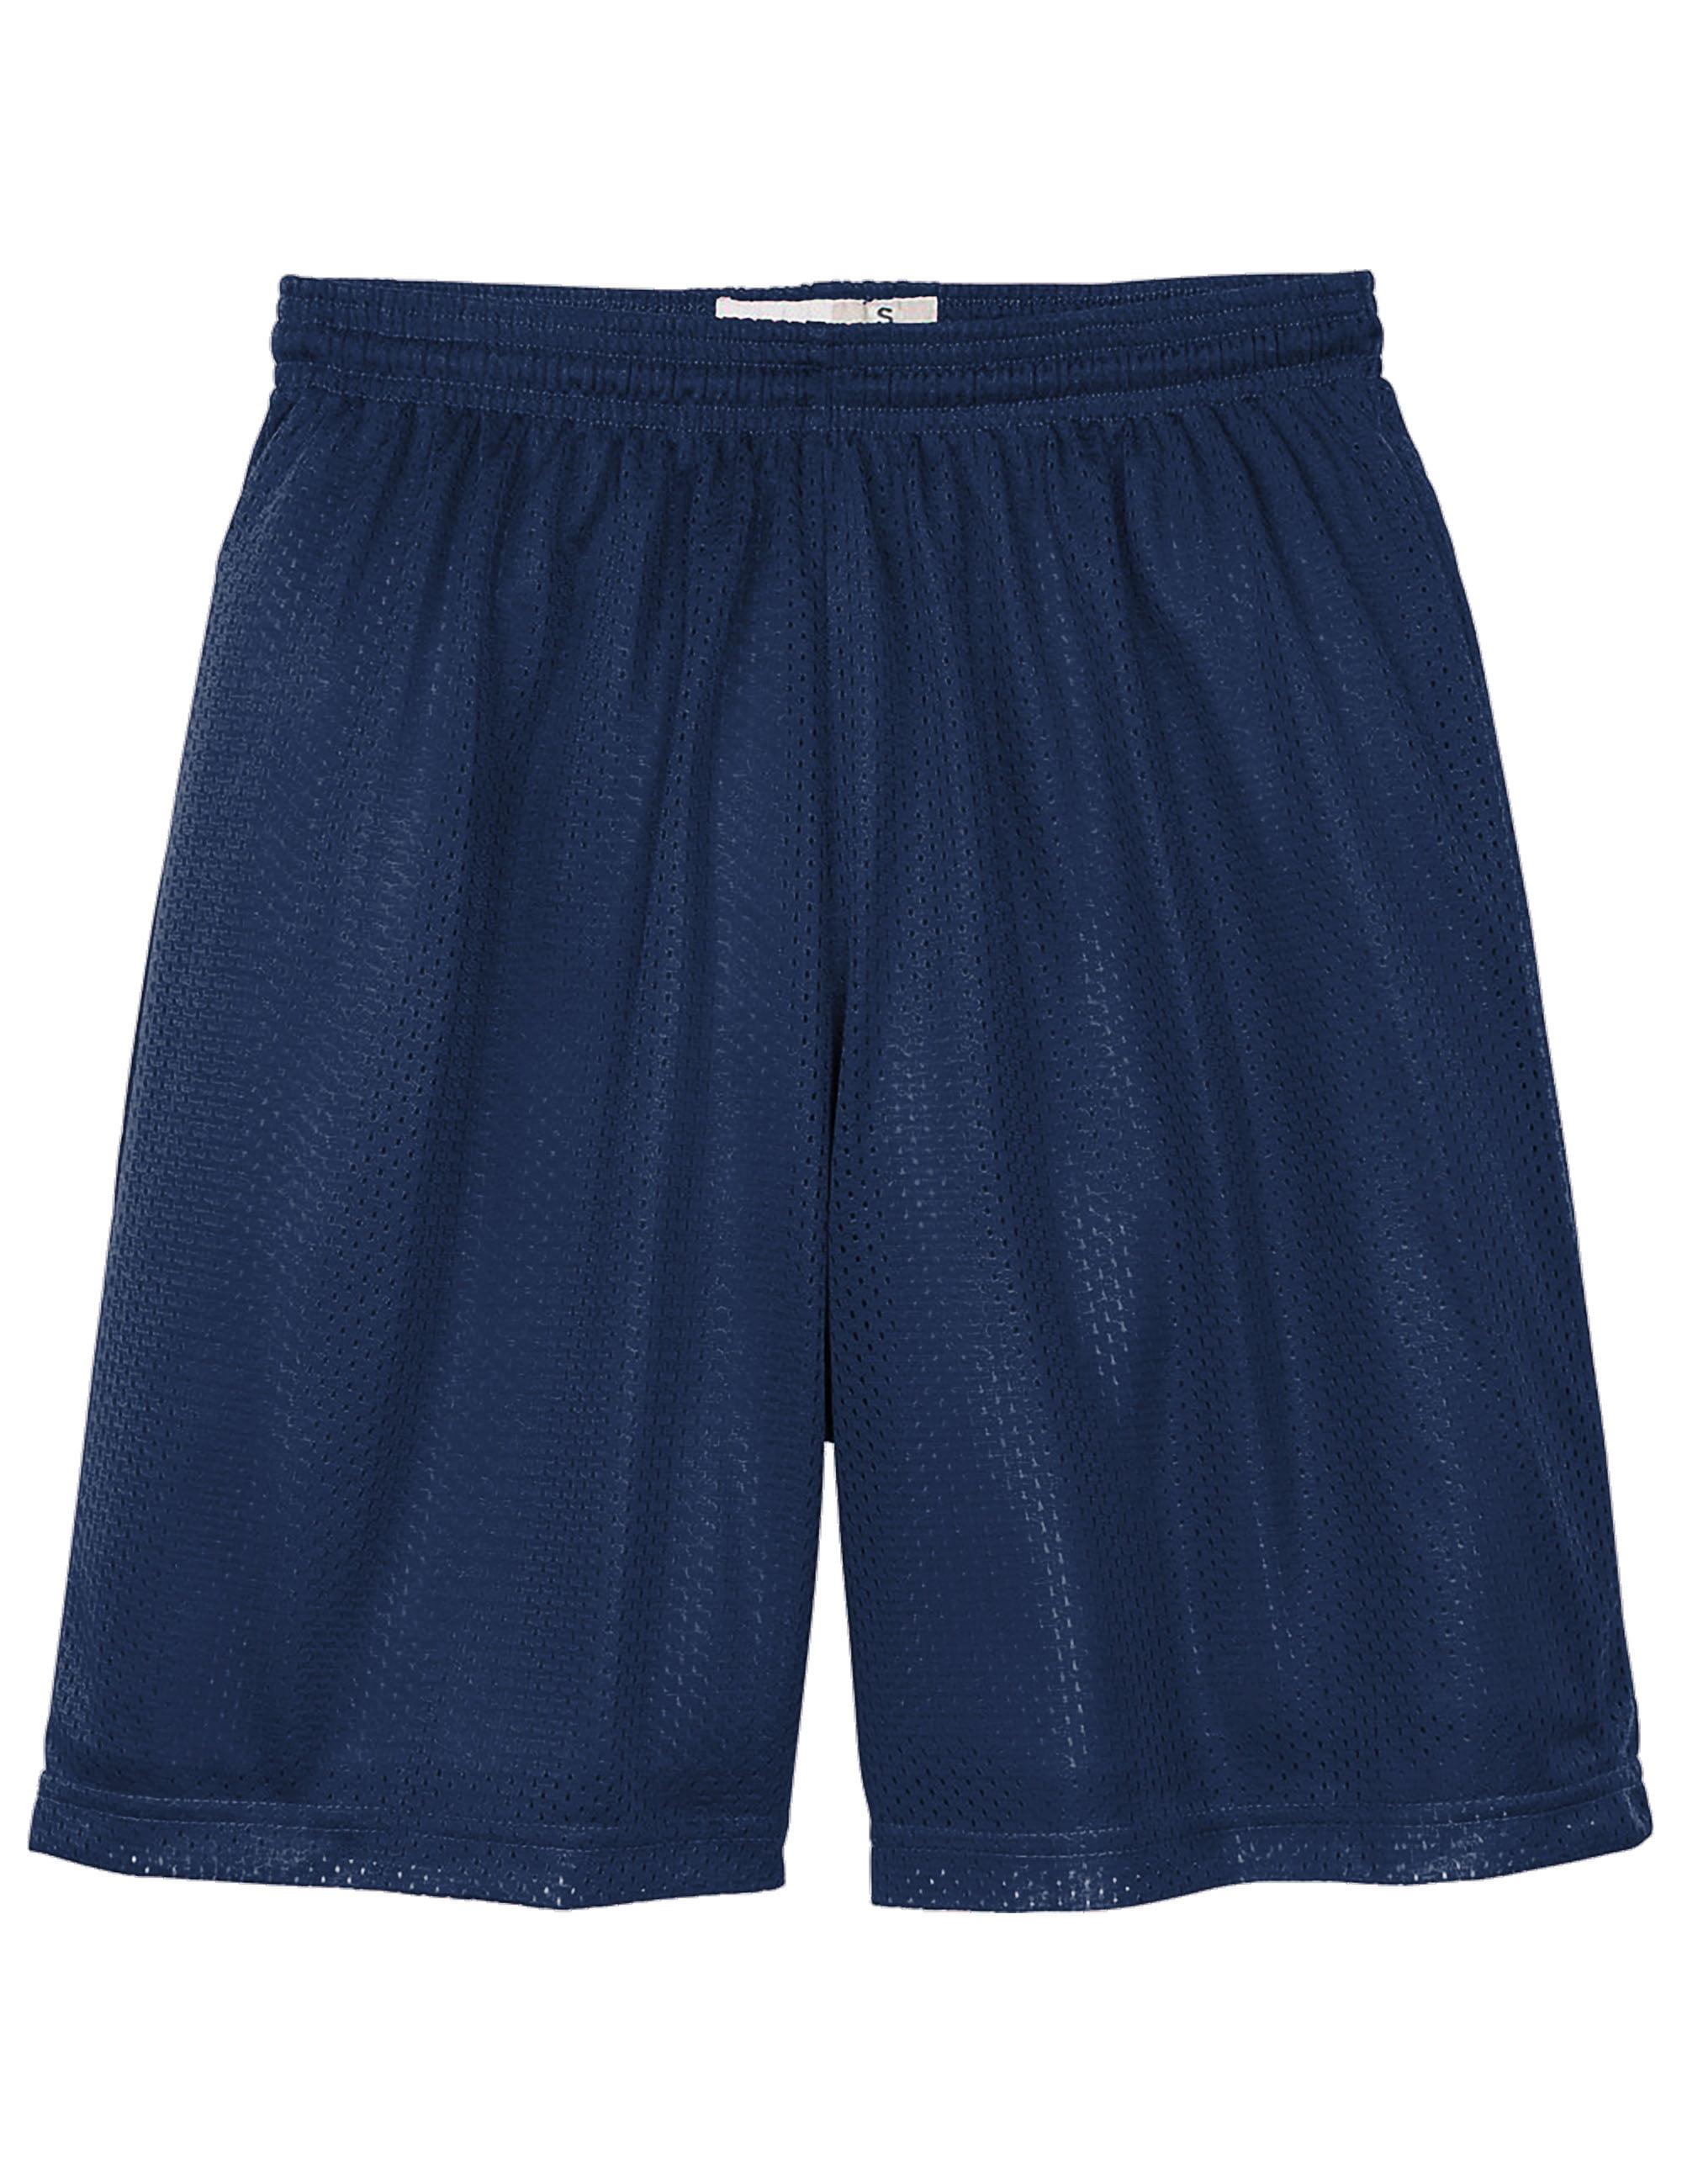 Kids Basketball Athletic Mesh Shorts